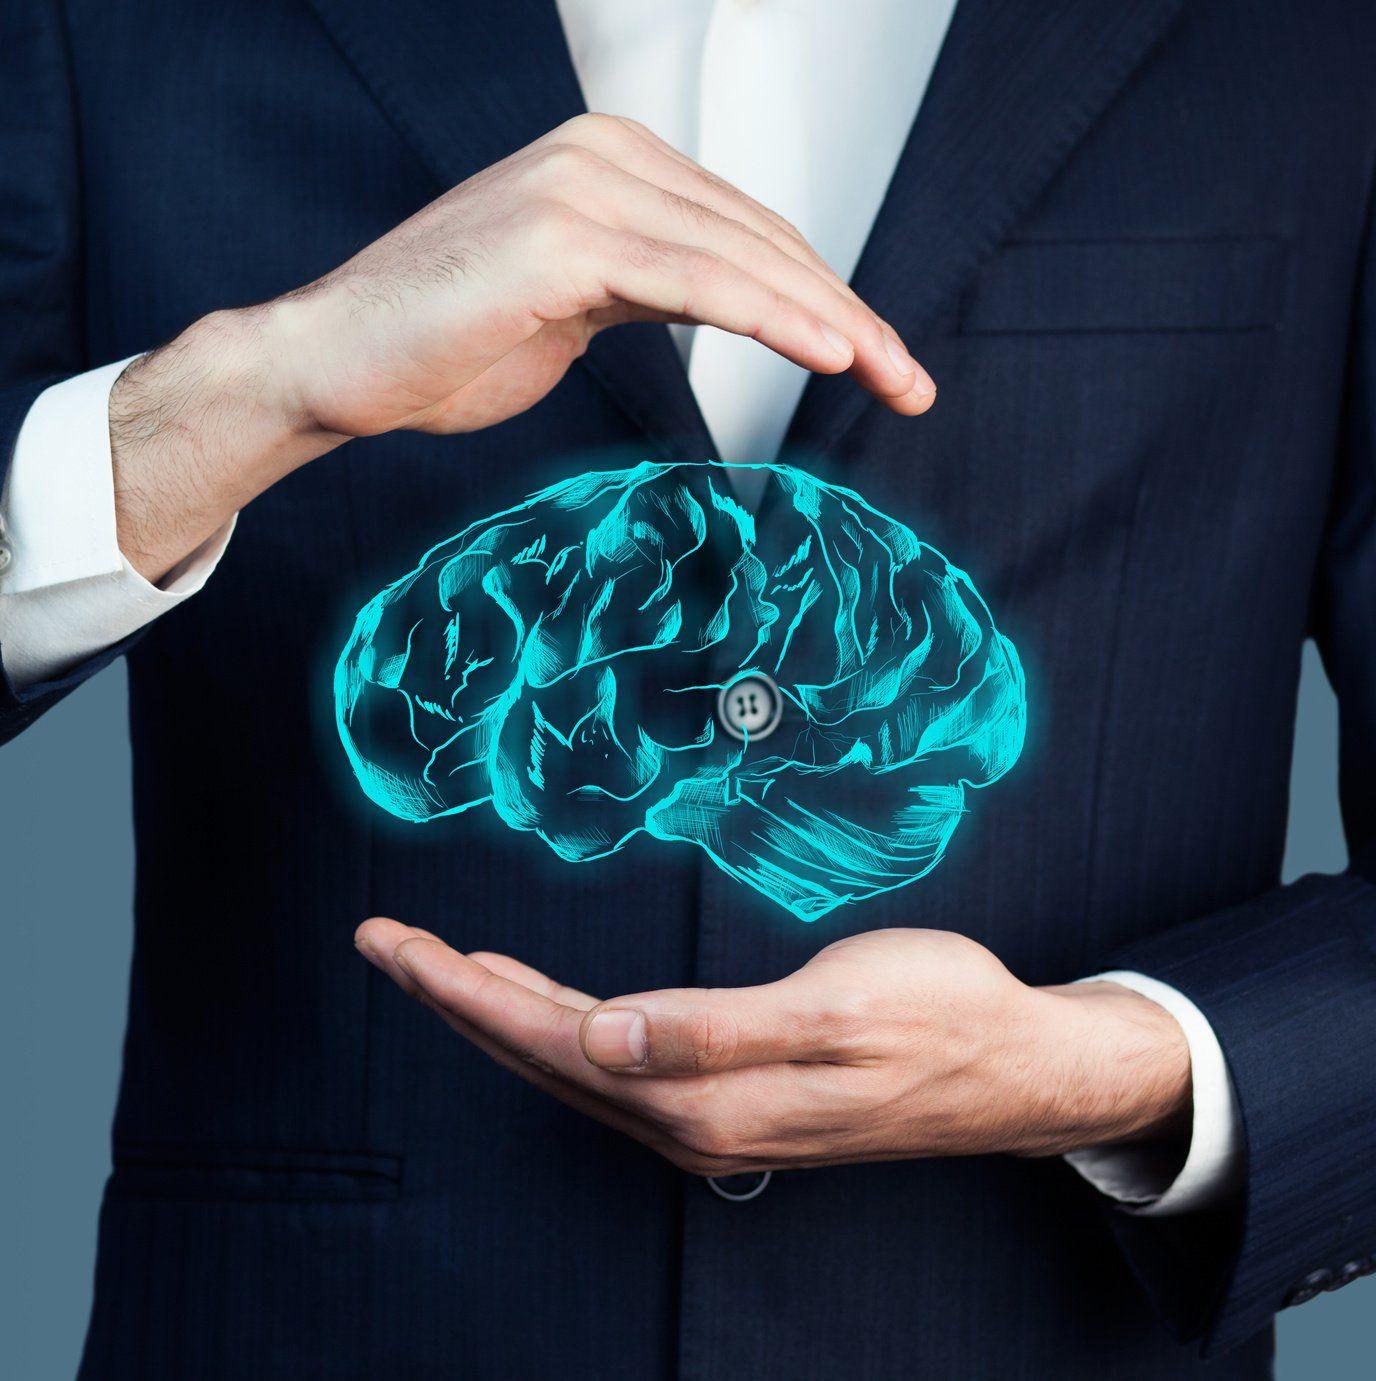 man hand brain | Intellectual property, Male hands, Patent